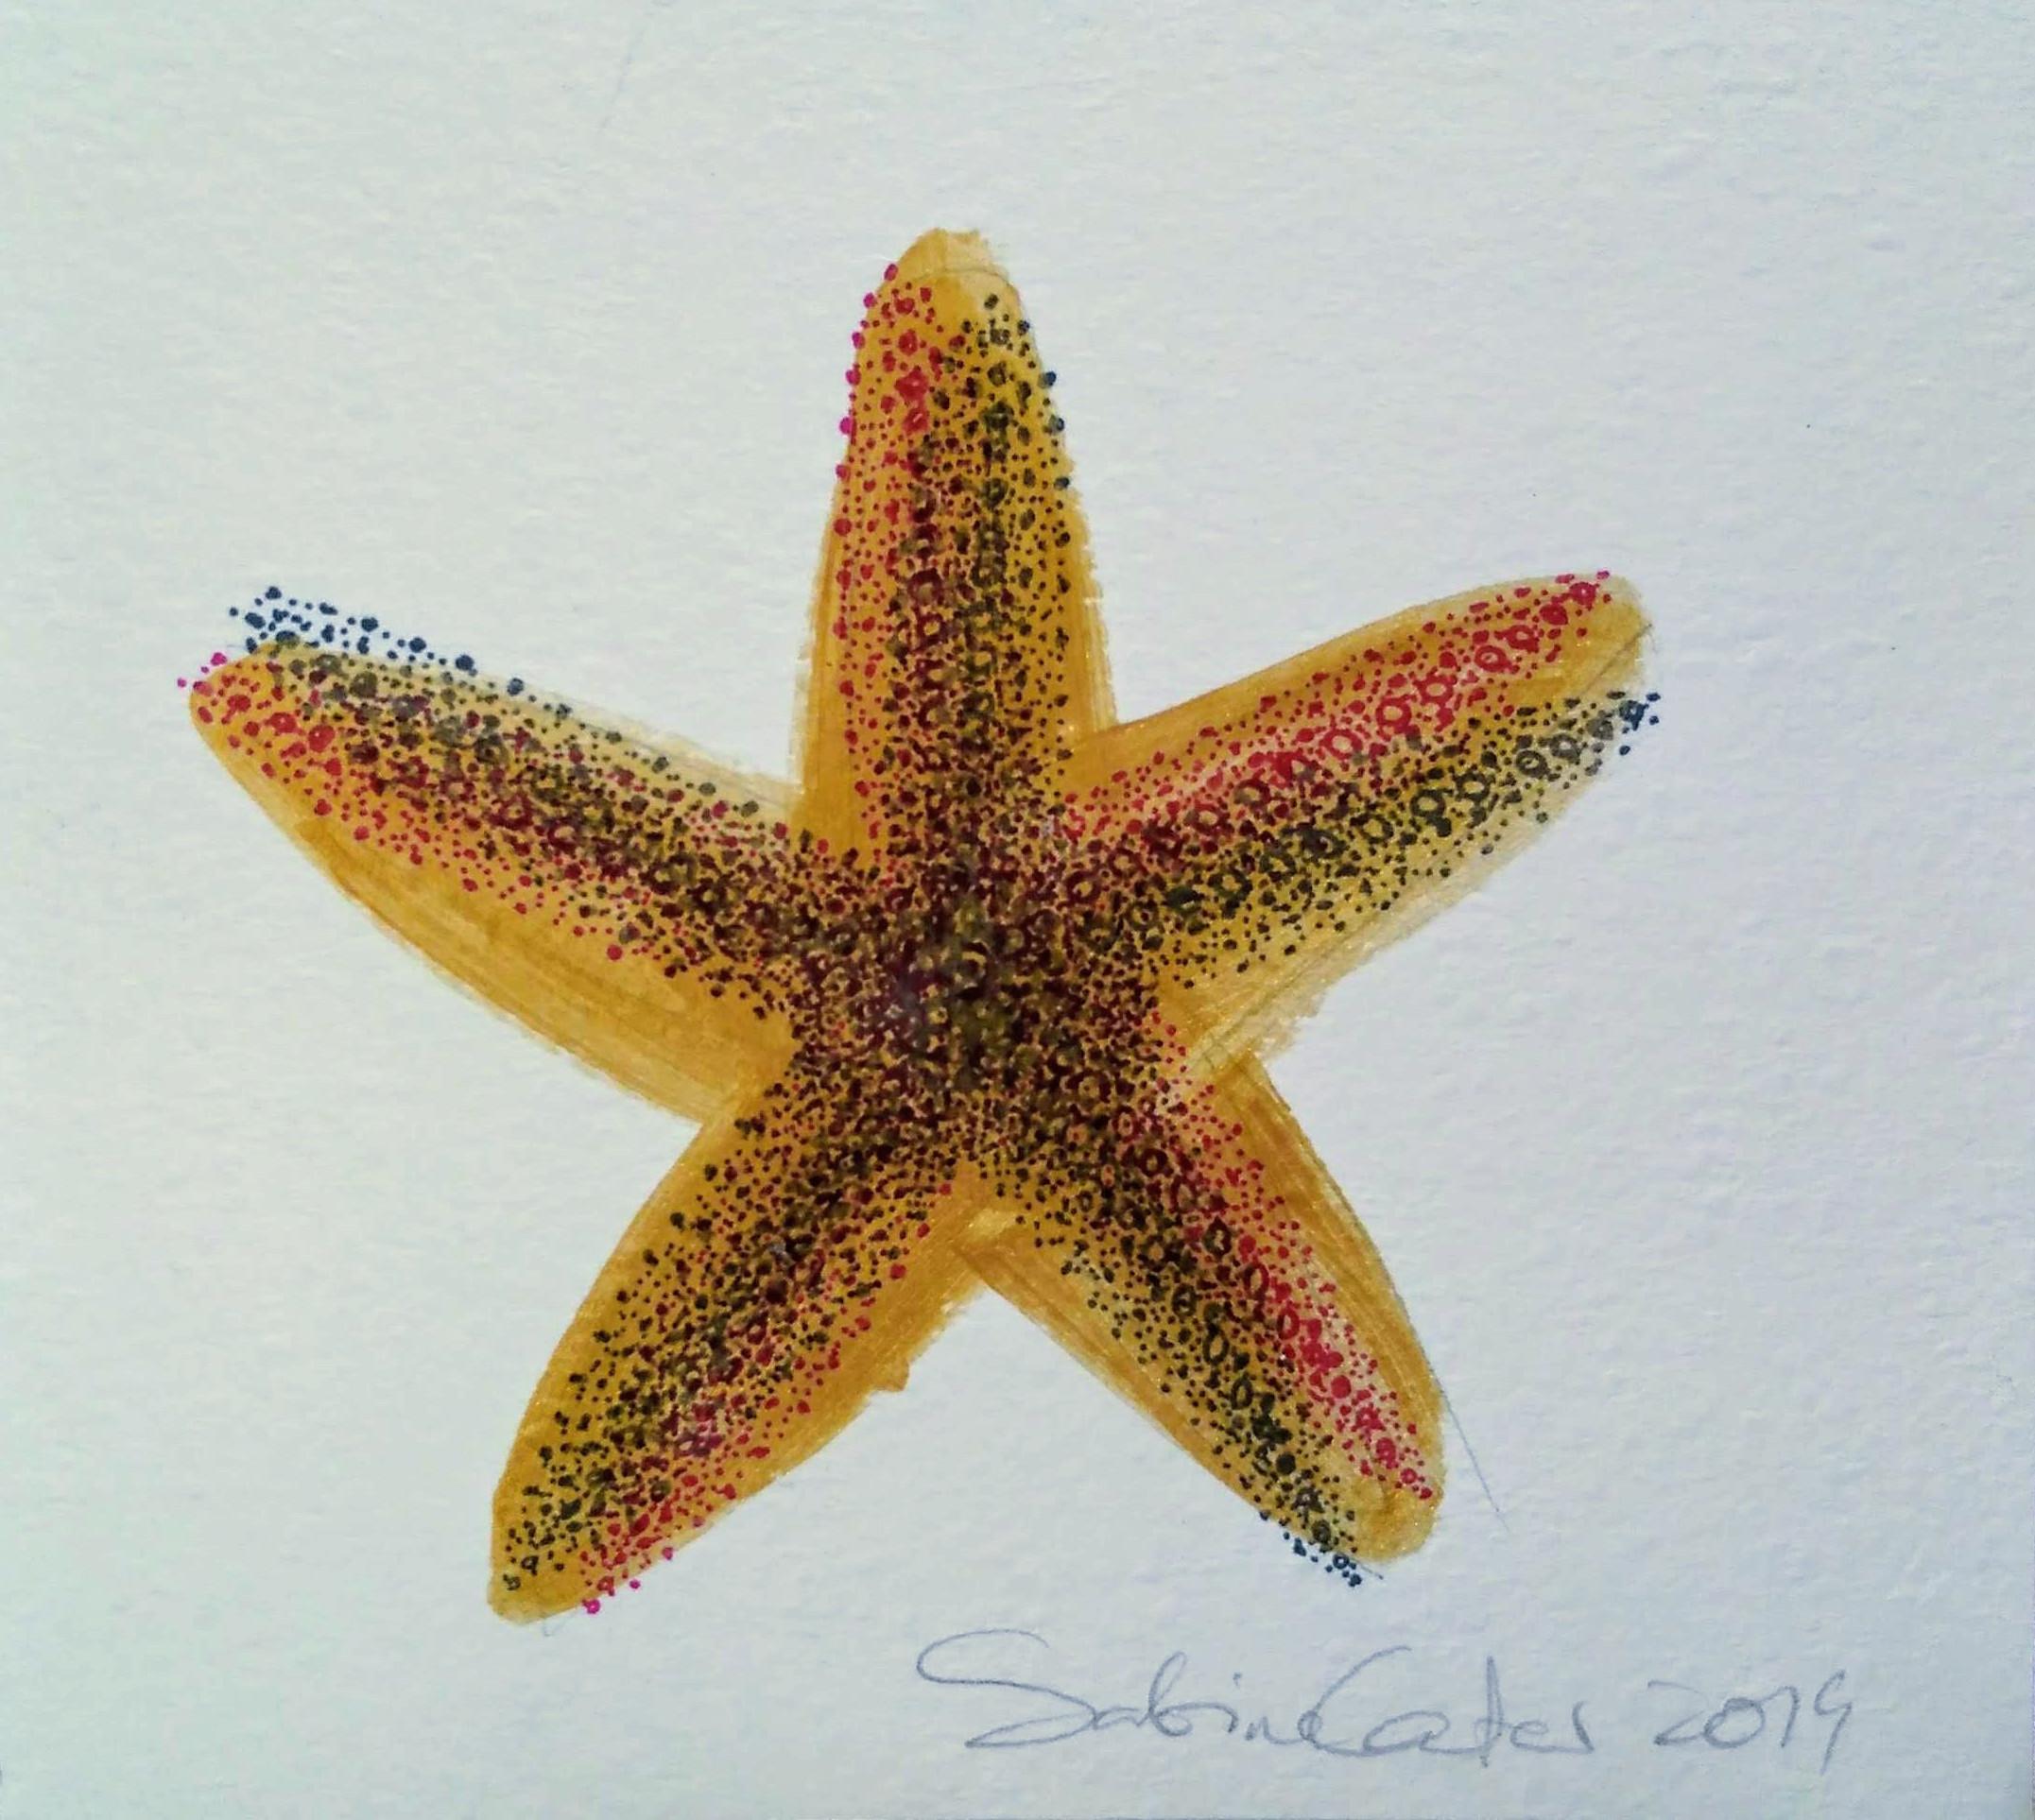 59_Sabine_Carter__Golden_Starfish.jpg